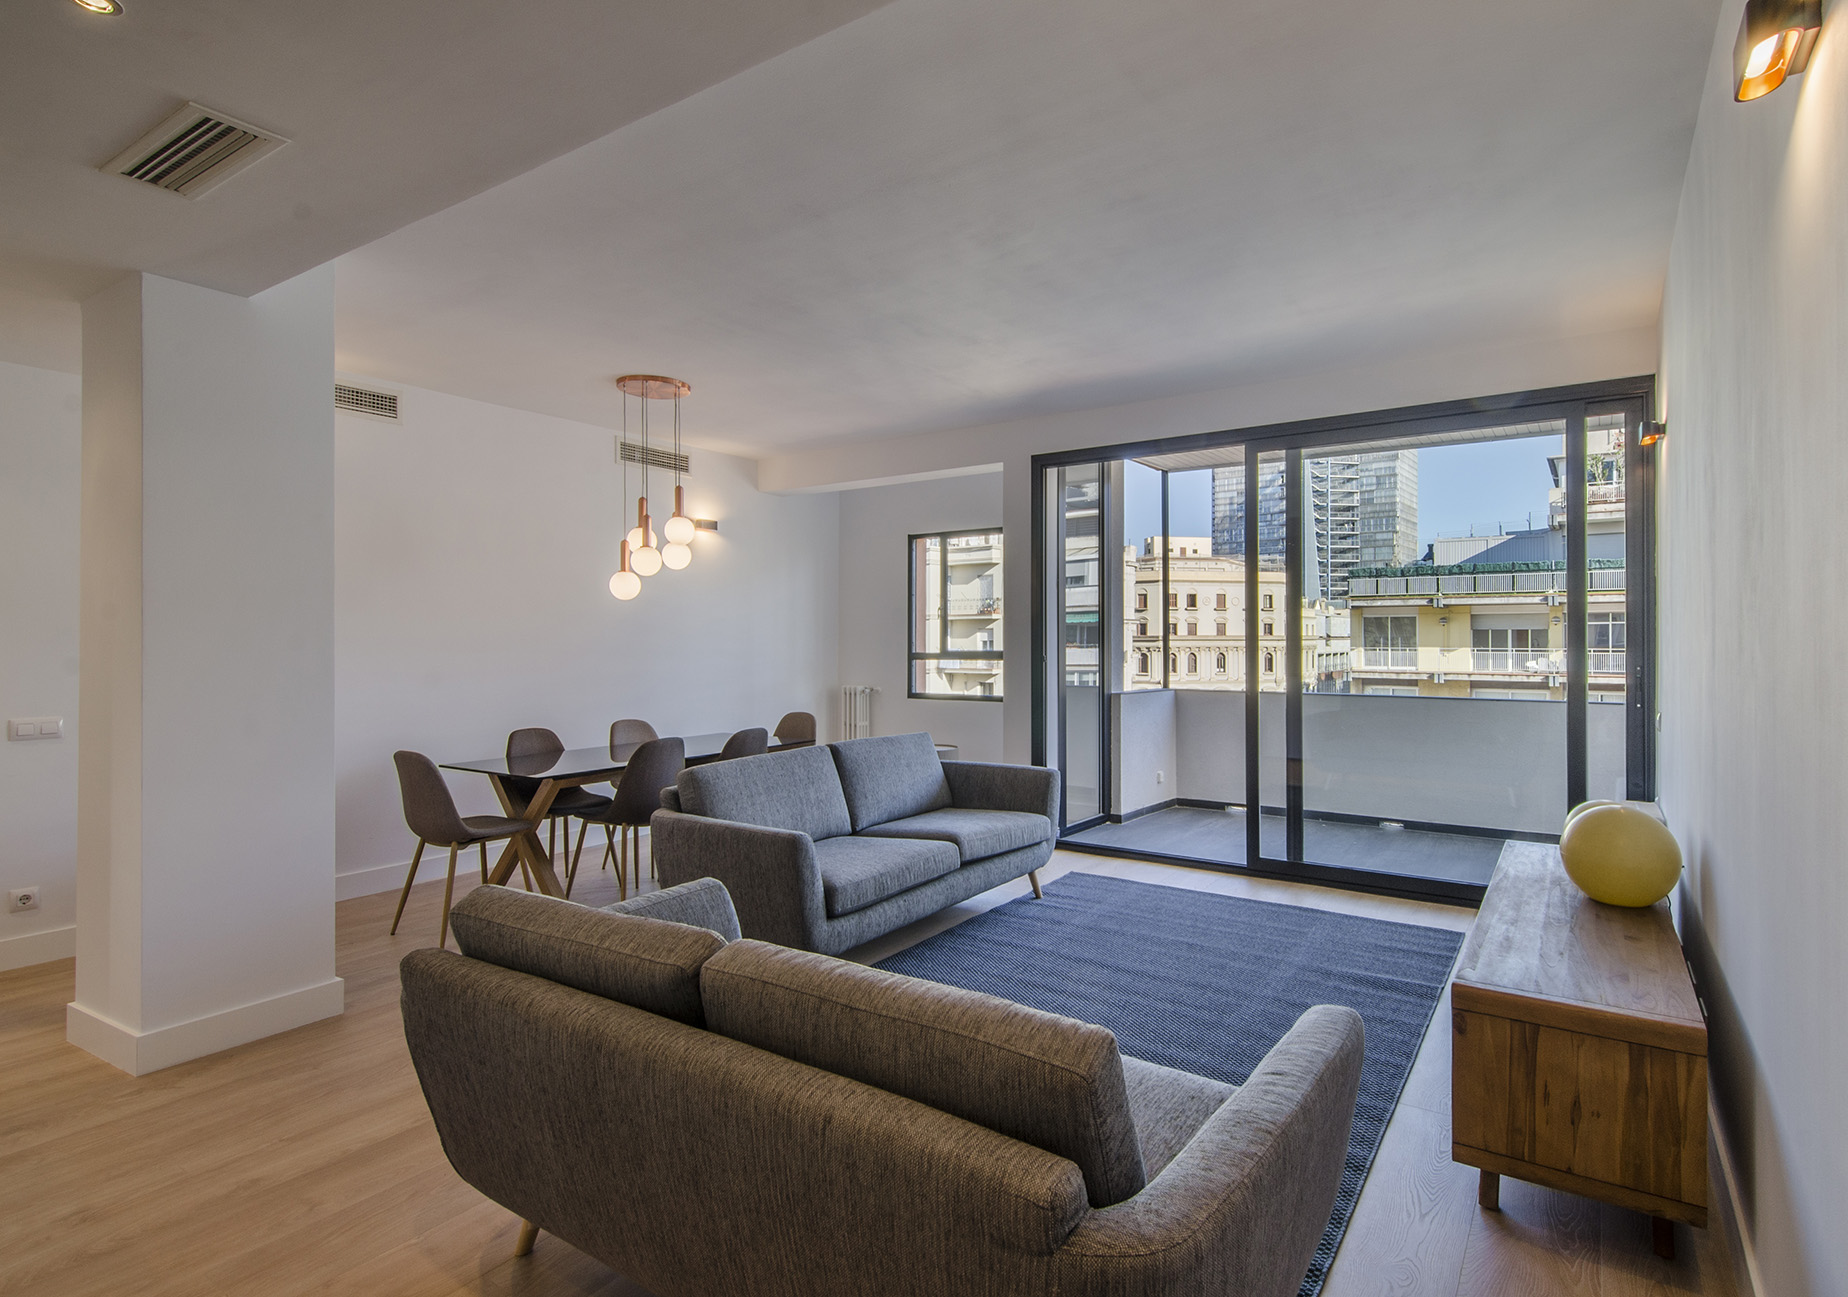 Apartamento para Venda às Superb bright and brand new flat with terrace in top location Barcelona City, Barcelona, 08034 Espanha